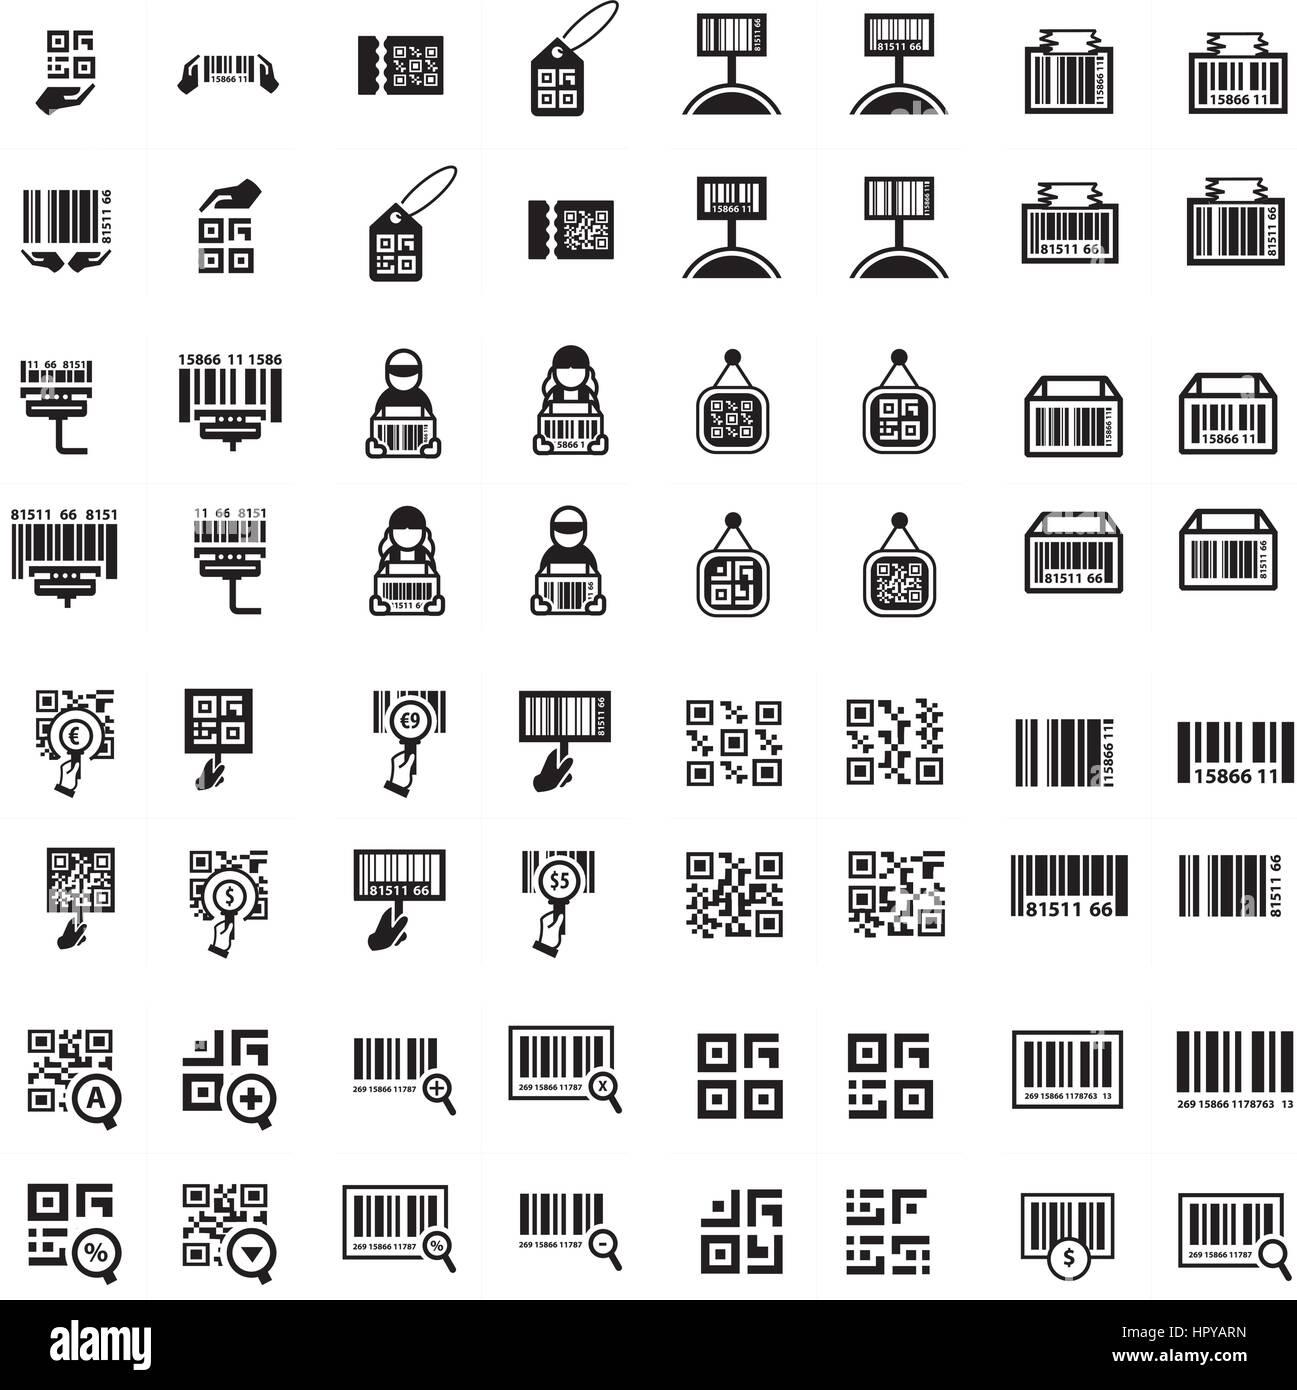 Unique Qr Code Stock Photos & Unique Qr Code Stock Images